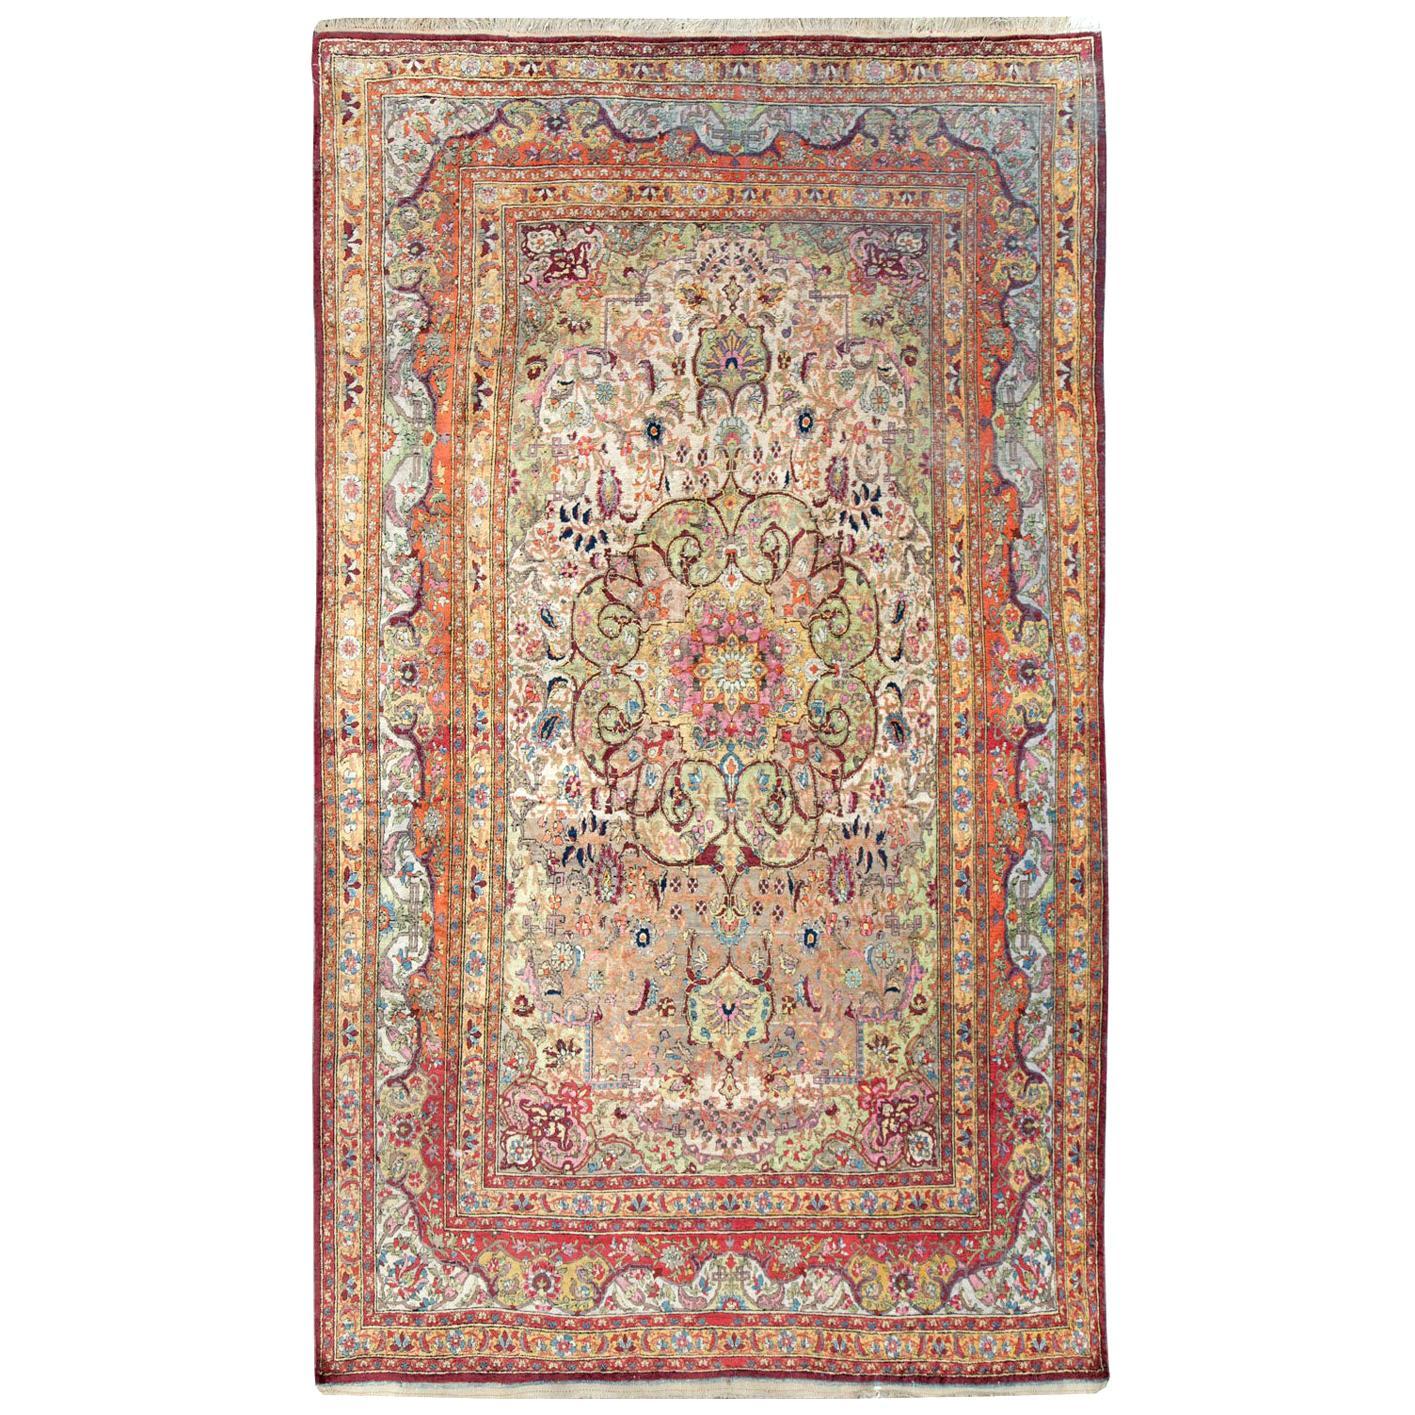 Antique Handmade Persian Silk Kashan Accent Rug